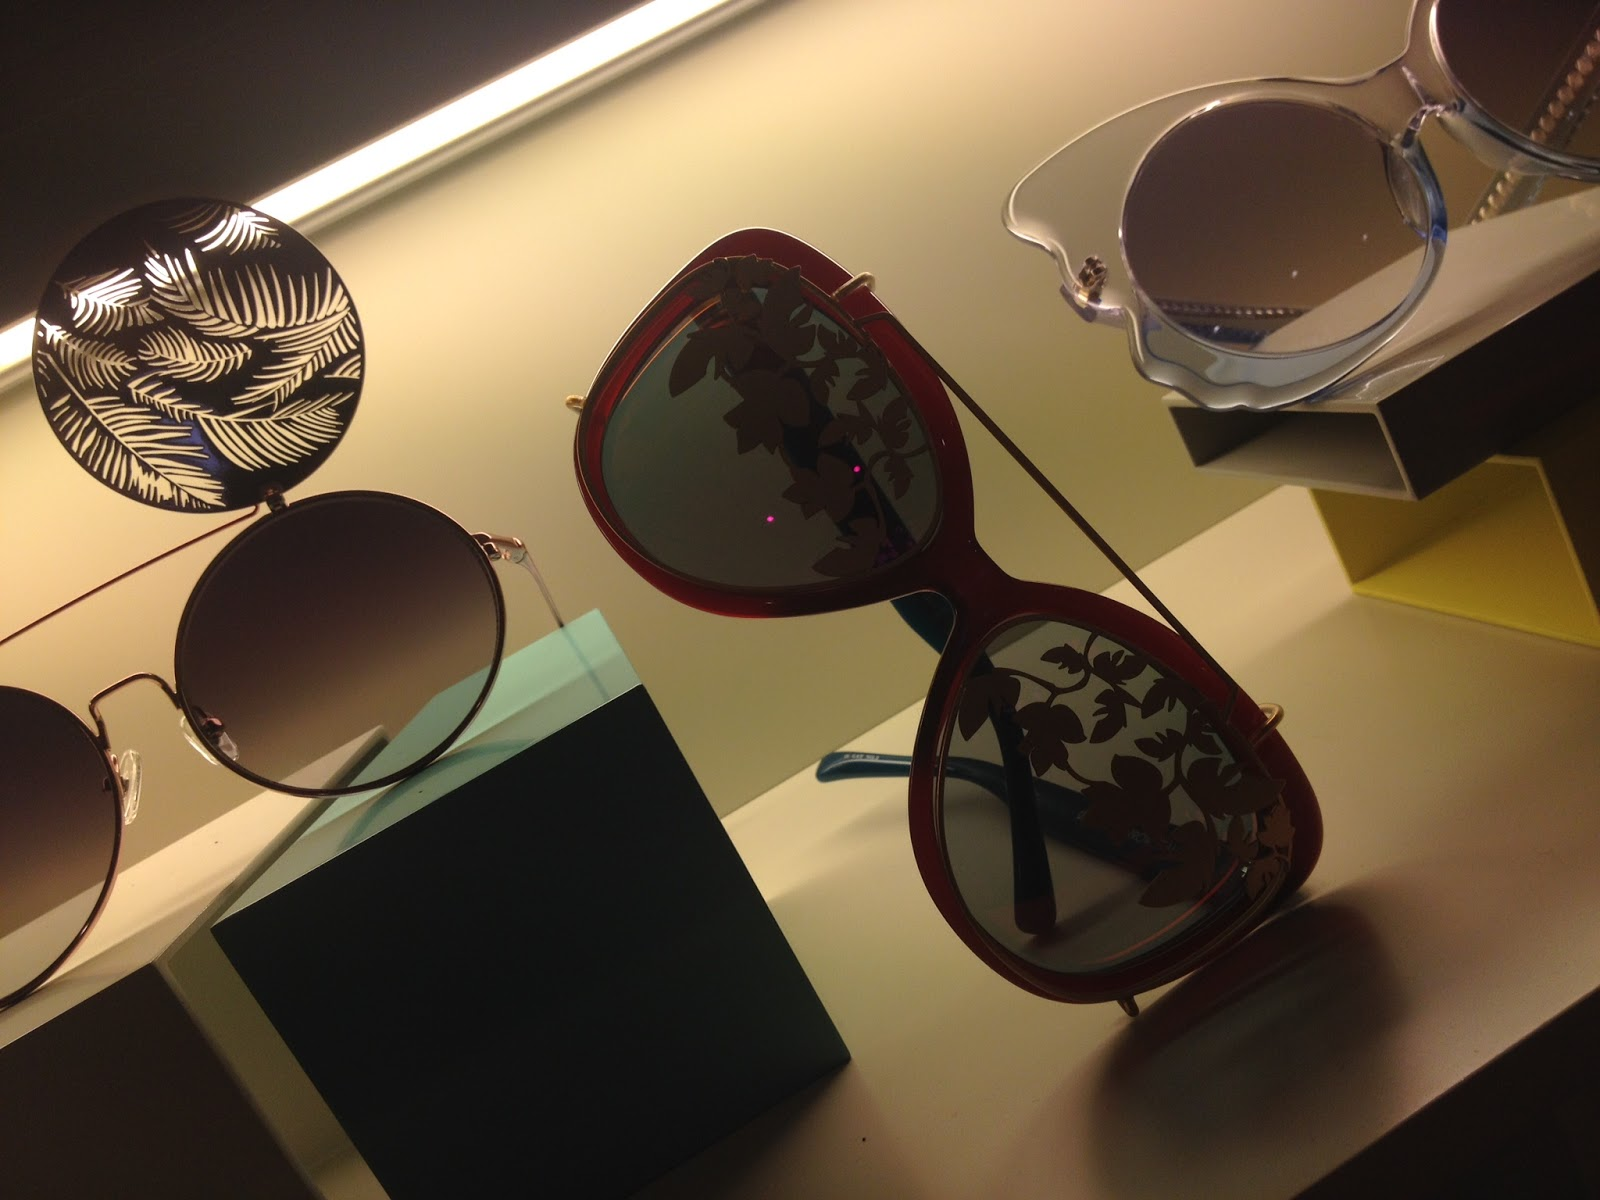 Ptica toscana nos presenta la colecci n de linda farrow - Optica toscana madrid ...